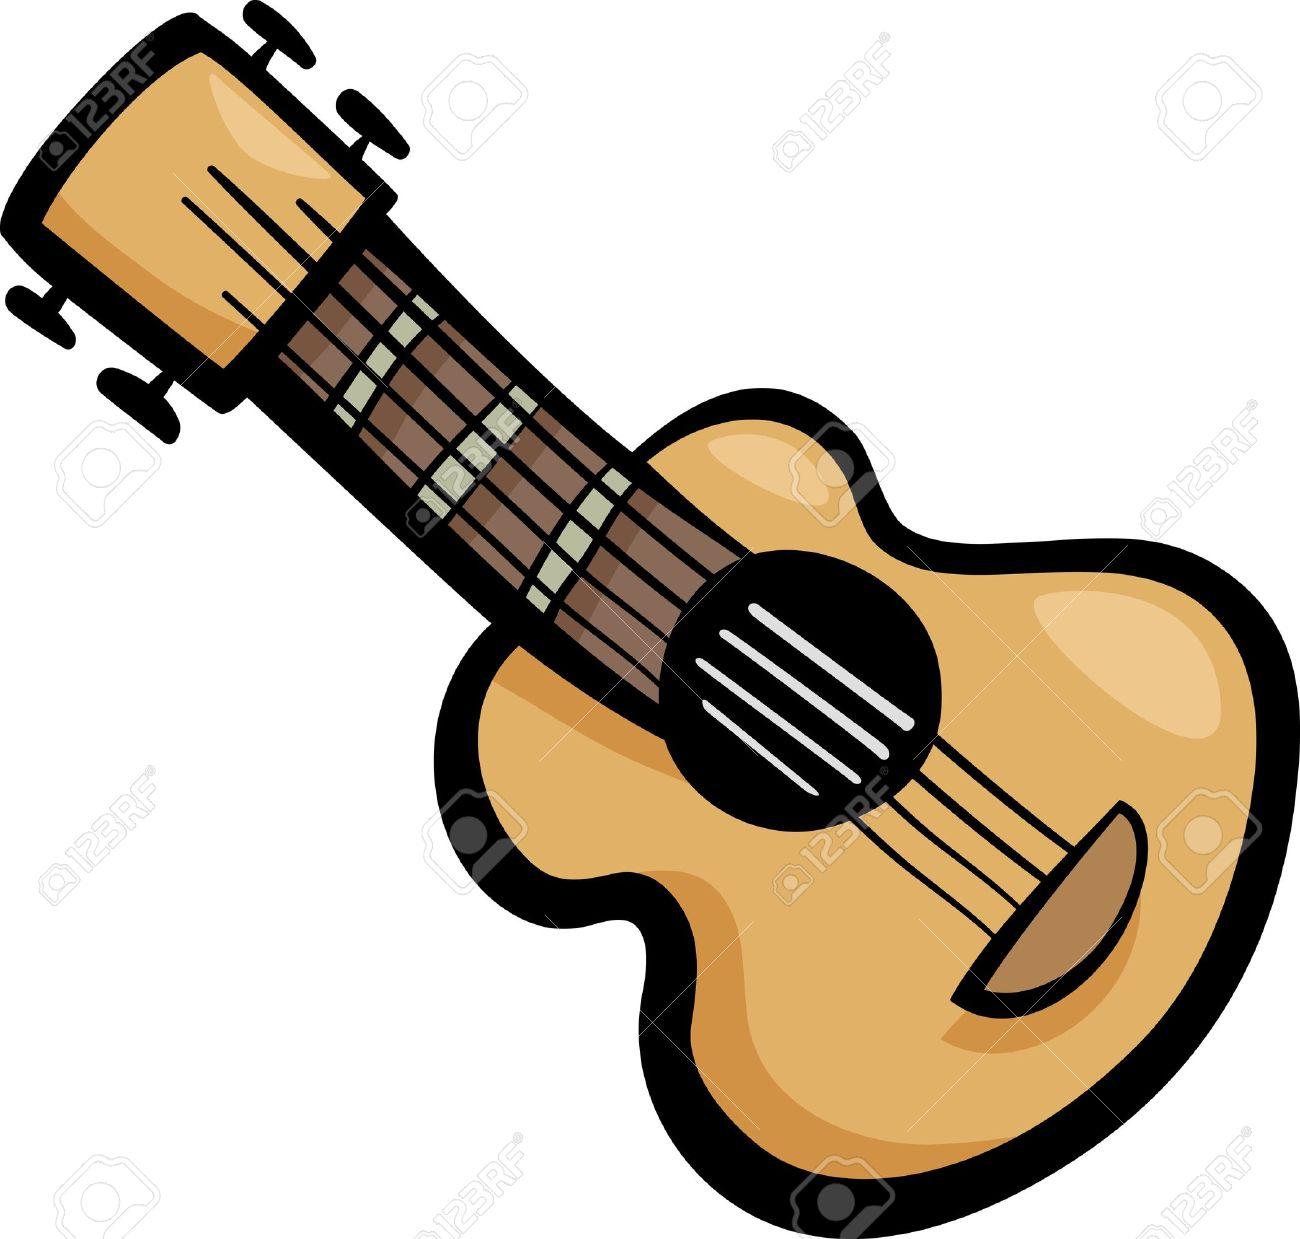 Clip Art Guitar Clip cartoon illustration of acoustic guitar ear clip art royalty free stock vector 21435322